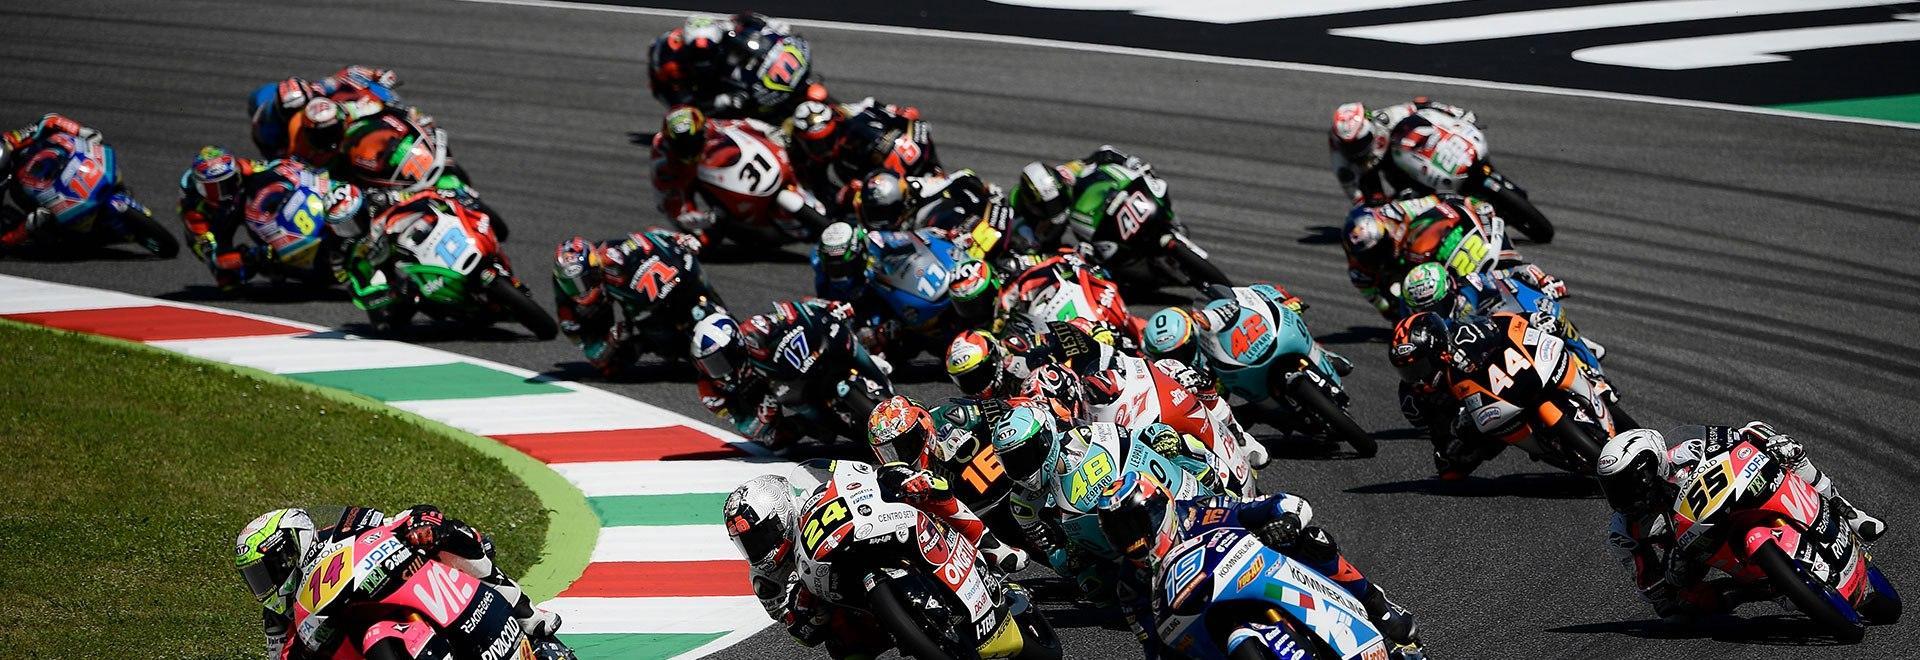 PreMoto3 Imola. Race 1